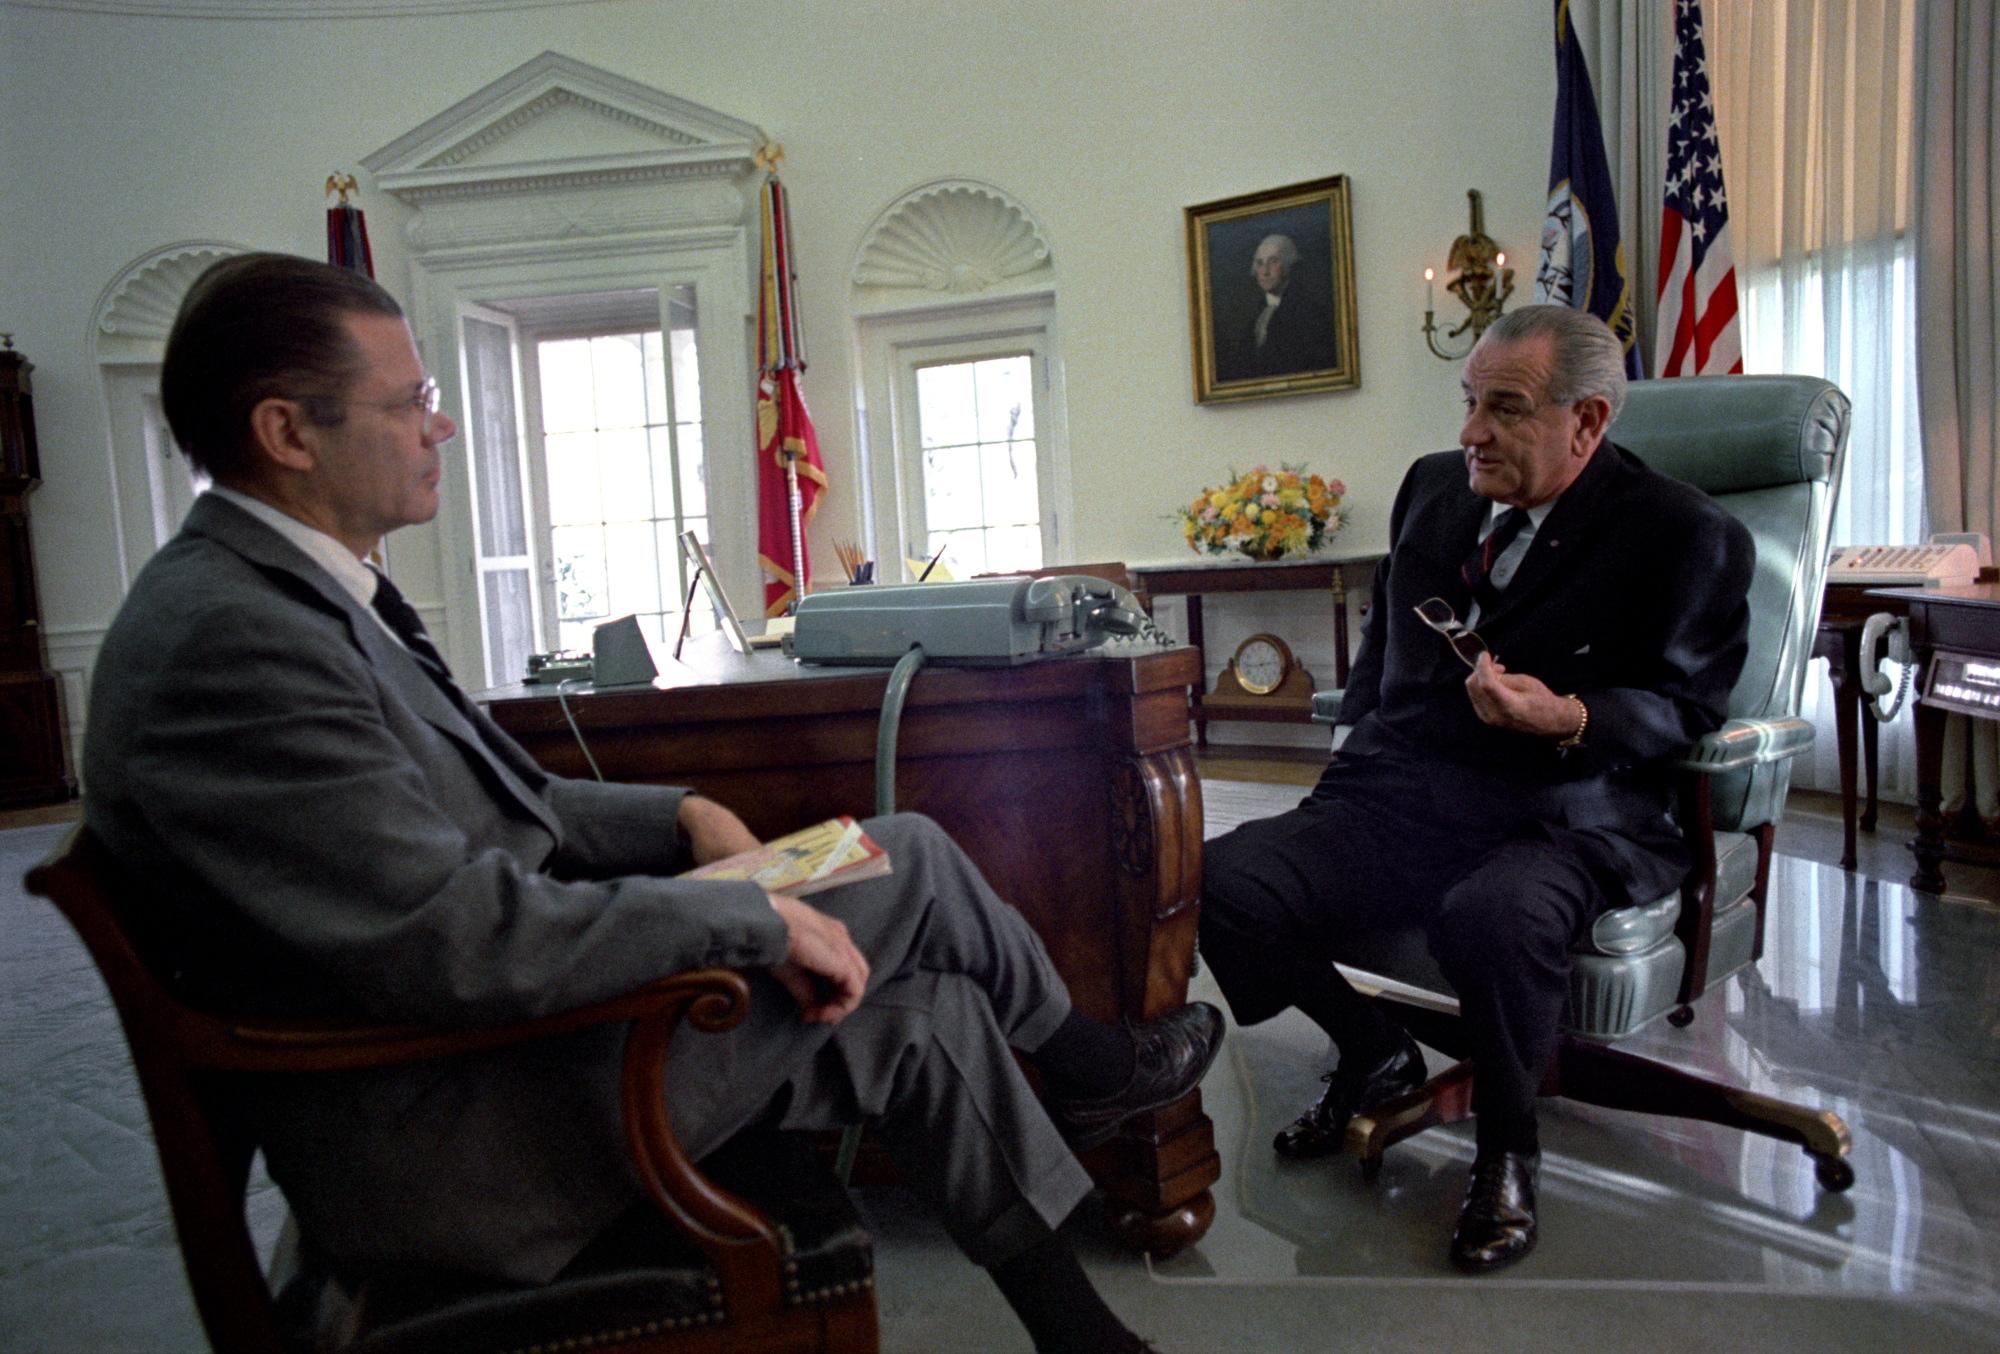 Линдон Джонсон и Роберт Макнамара, министр обороны США.